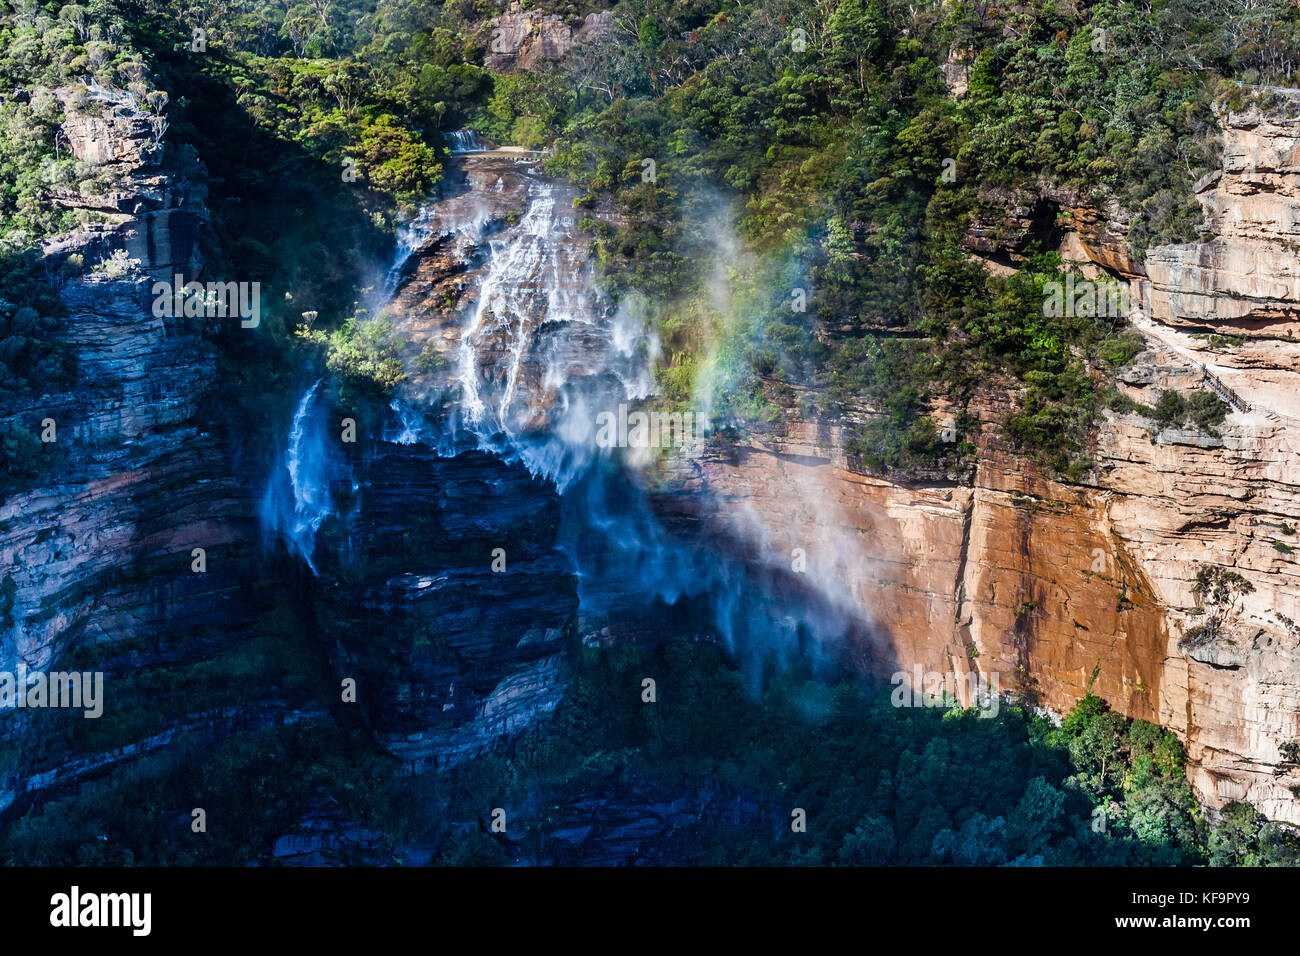 Starker Wind verhindert Katoomba Falls fallen. Blue Mountains National Park, NSW, Australien Stockbild